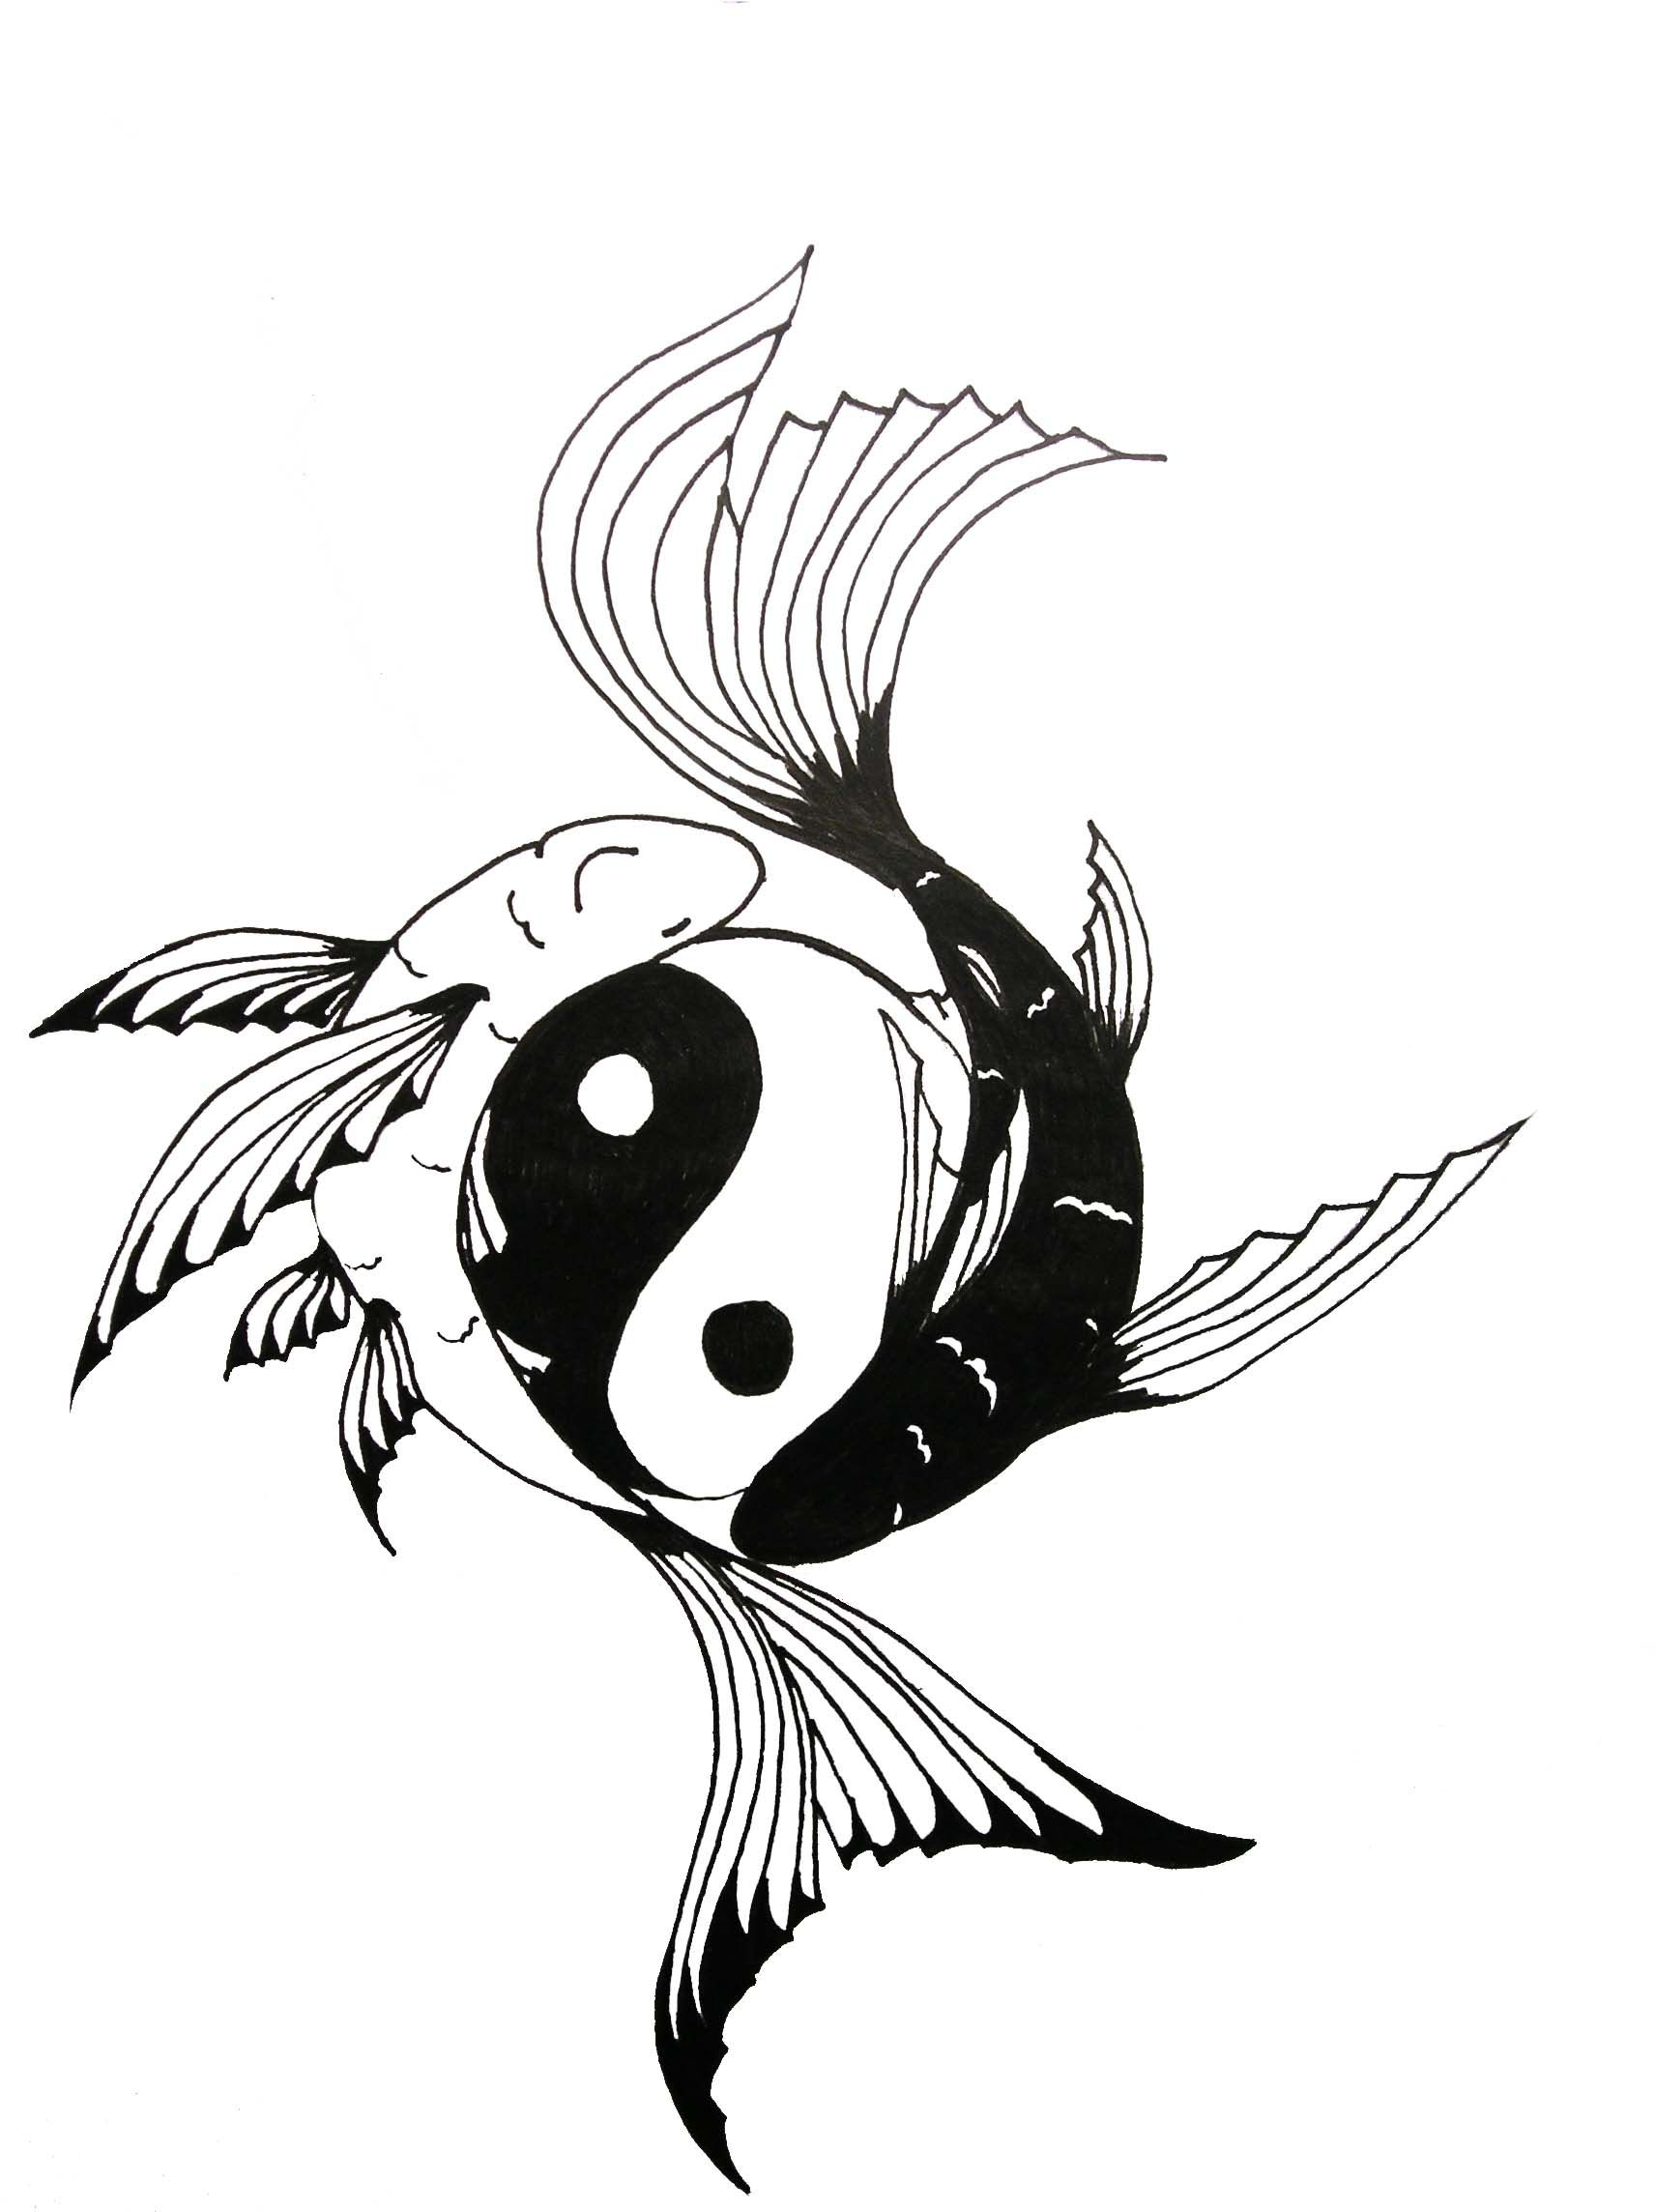 Yin yang tattoo by darkmoon17iantart on deviantart dale yin yang tattoo by darkmoon17iantart on deviantart biocorpaavc